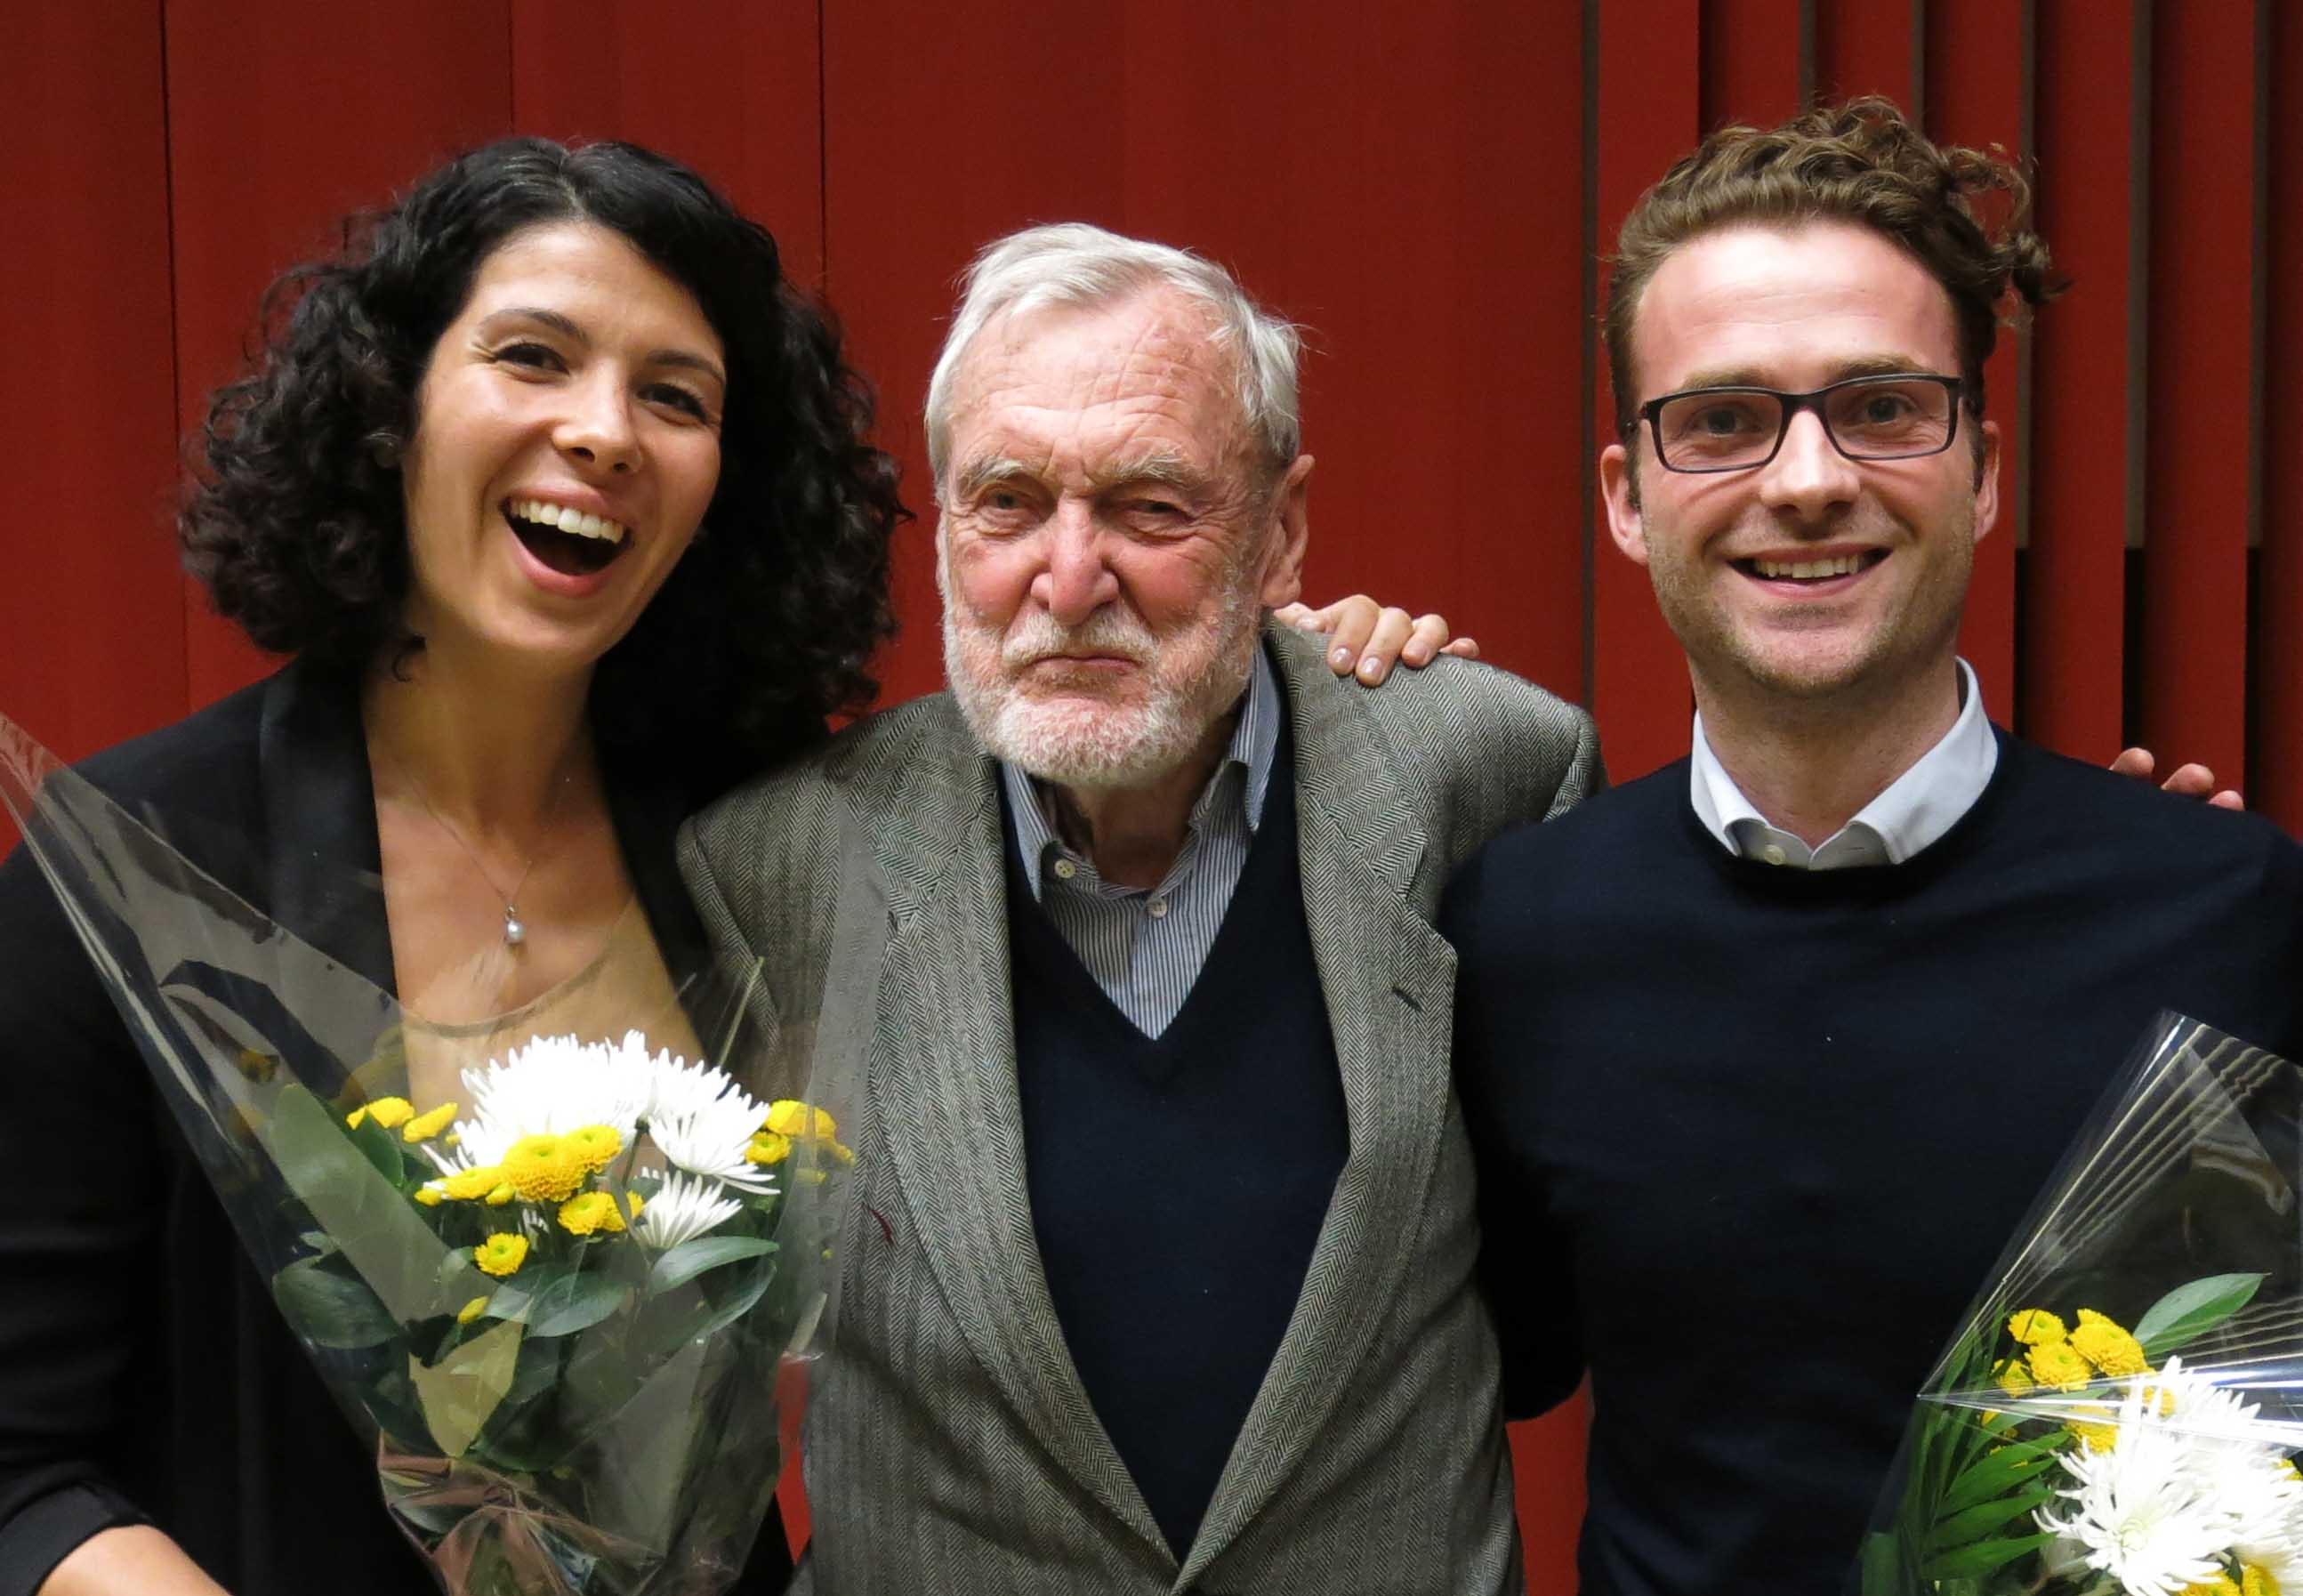 Biaggi de Blasys 2016 Award to Sebastiano Bariselli